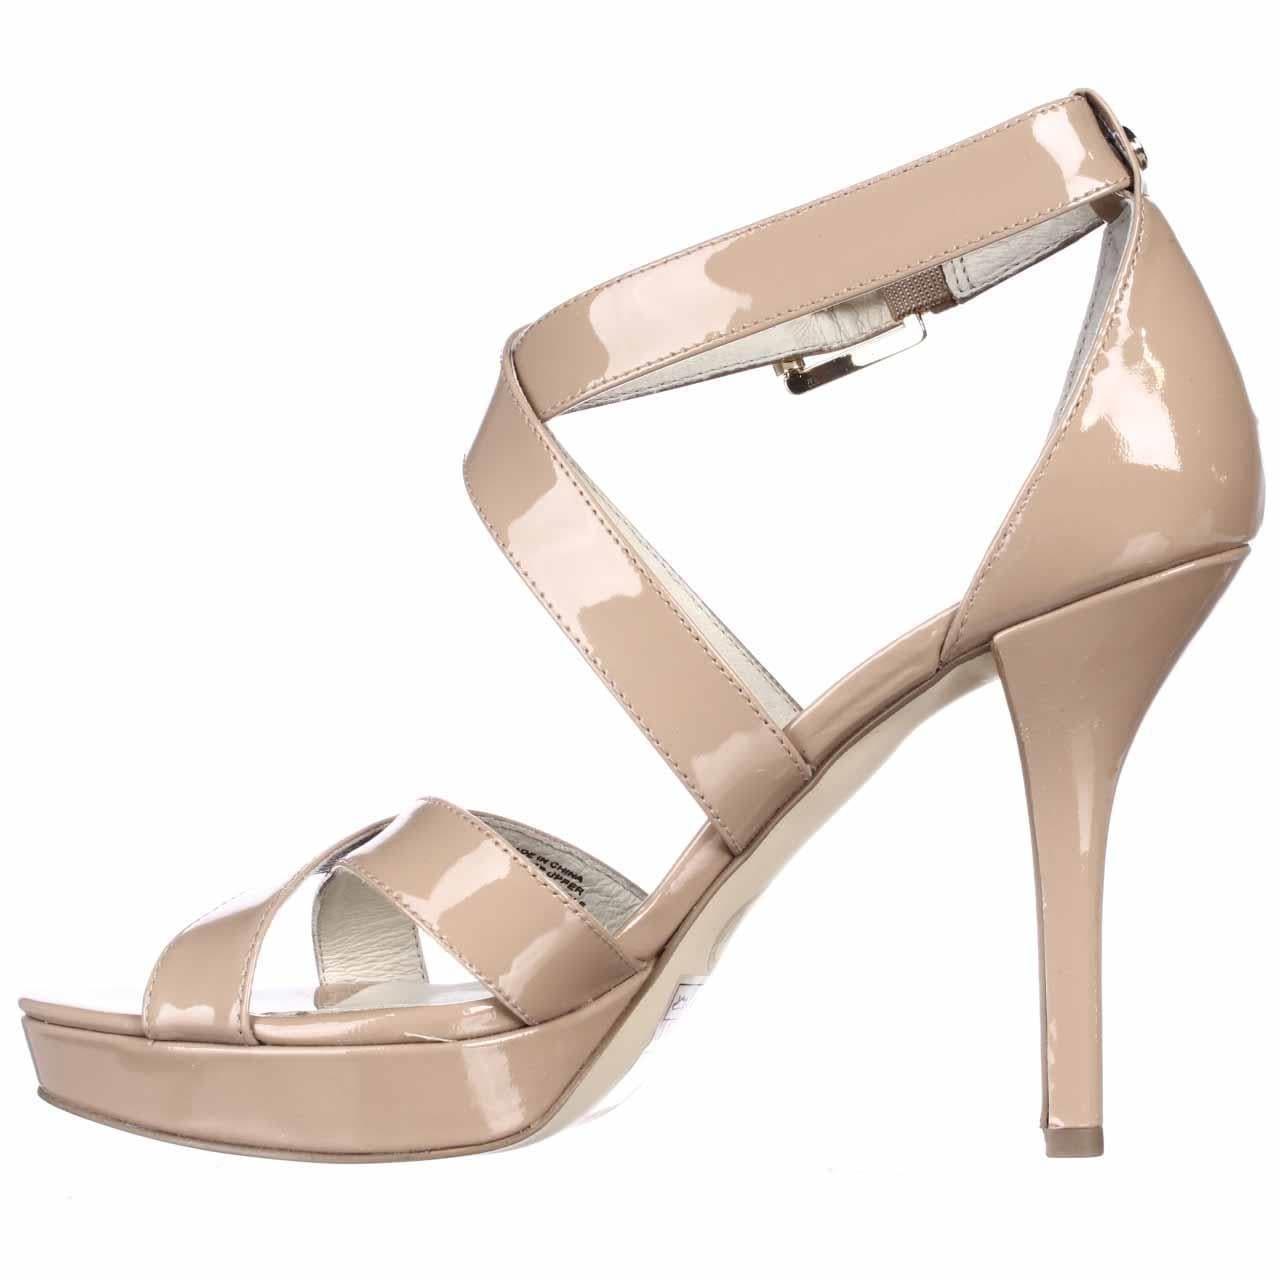 dfb3b60bbfd Shop MICHAEL Michael Kors Evie Platform Evening Sandals